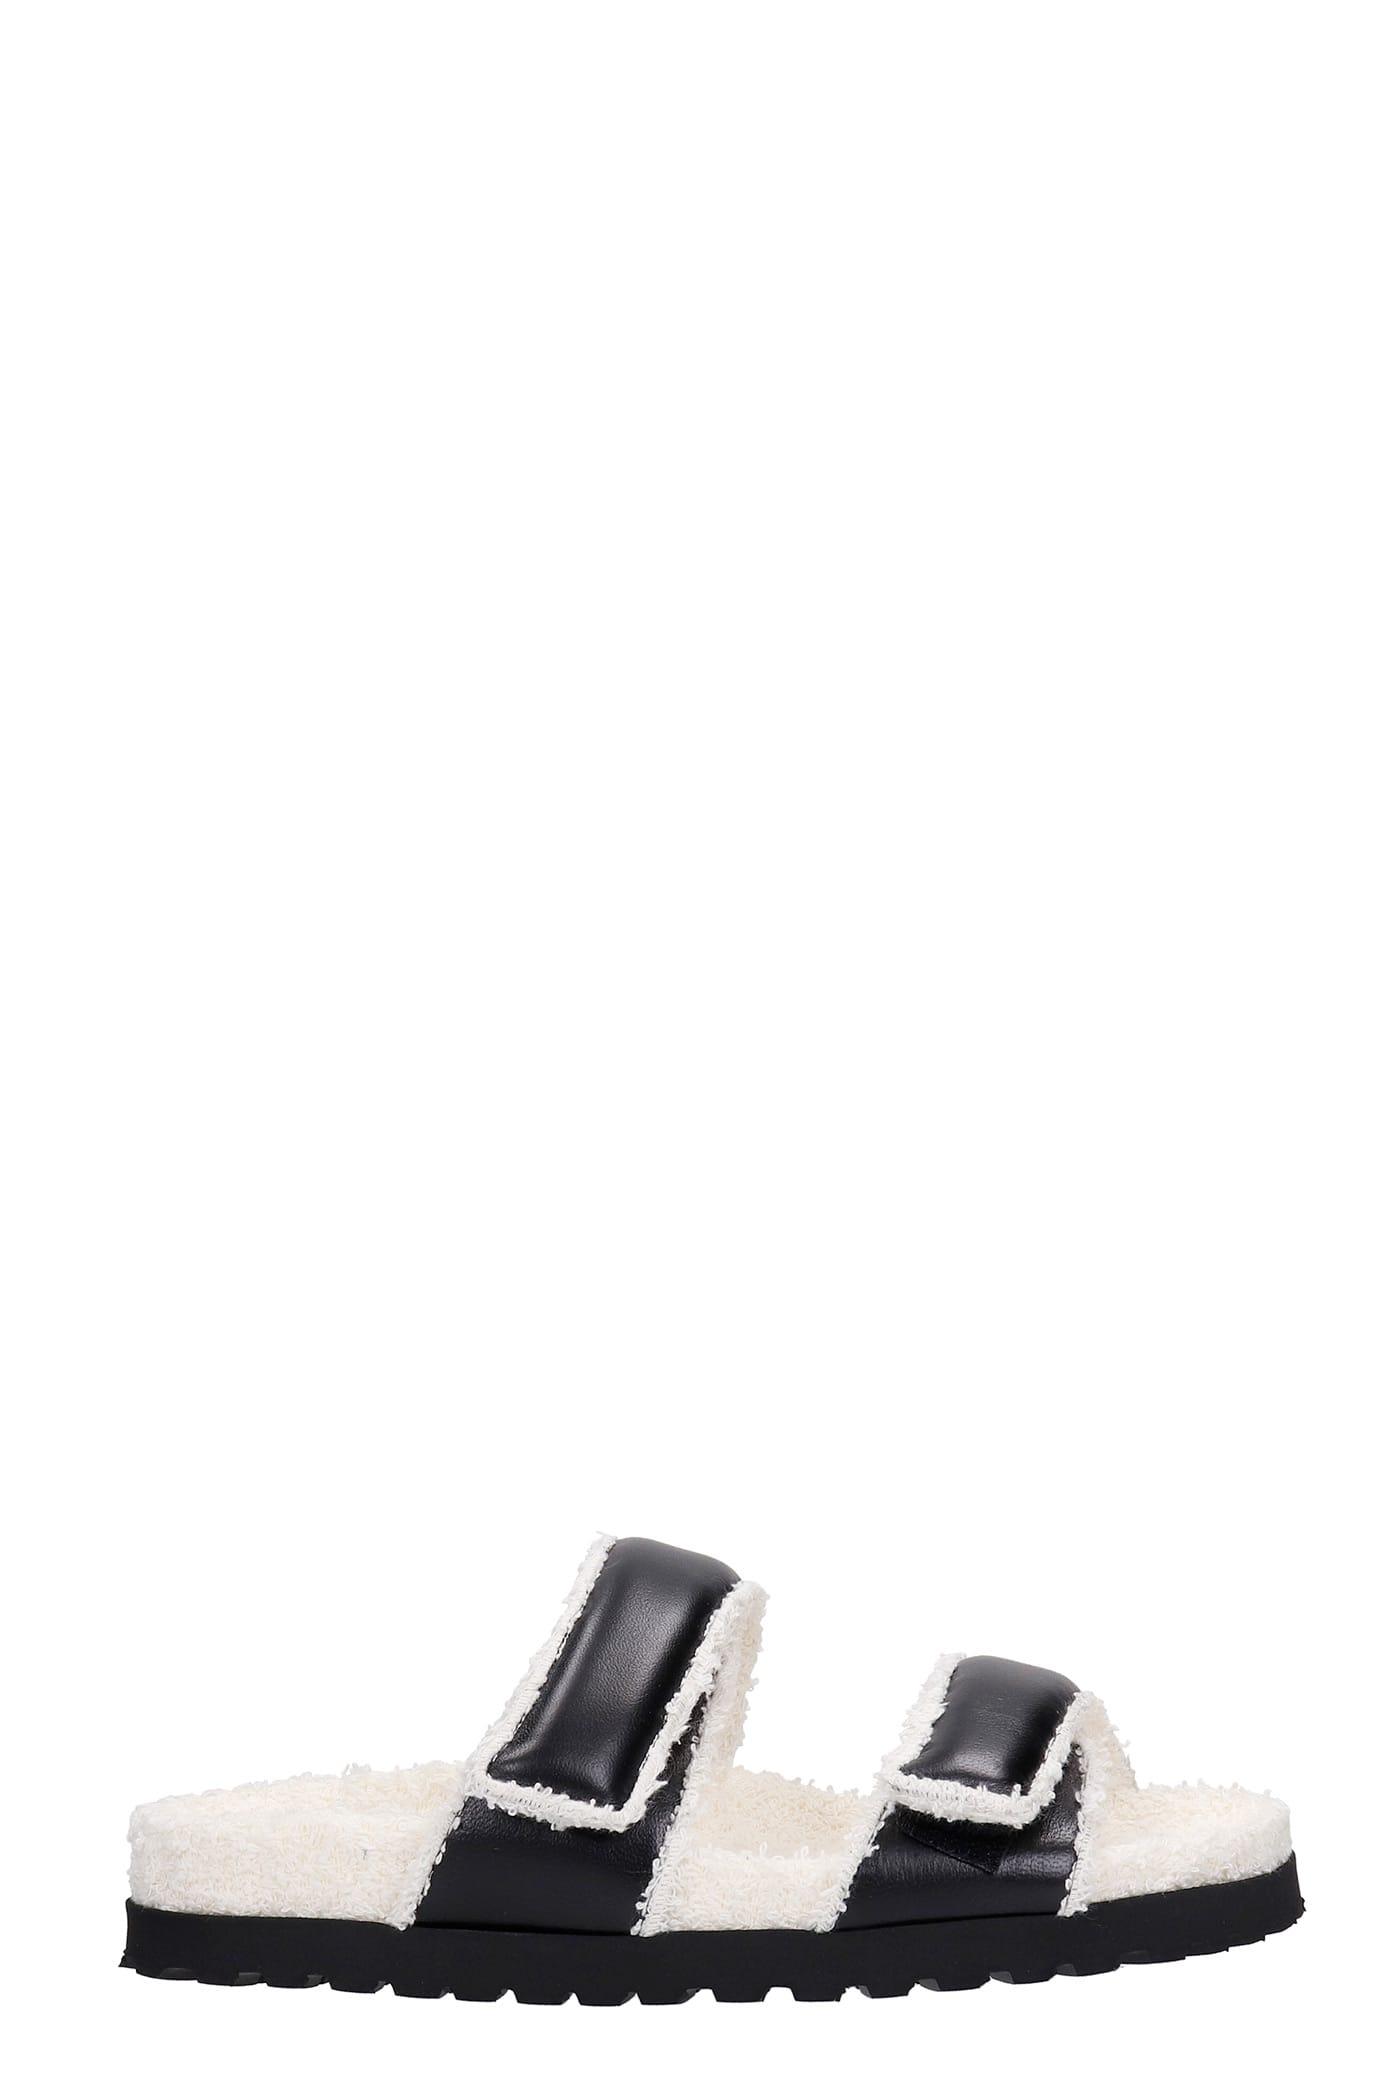 Perni 11 Flats In Black Leather